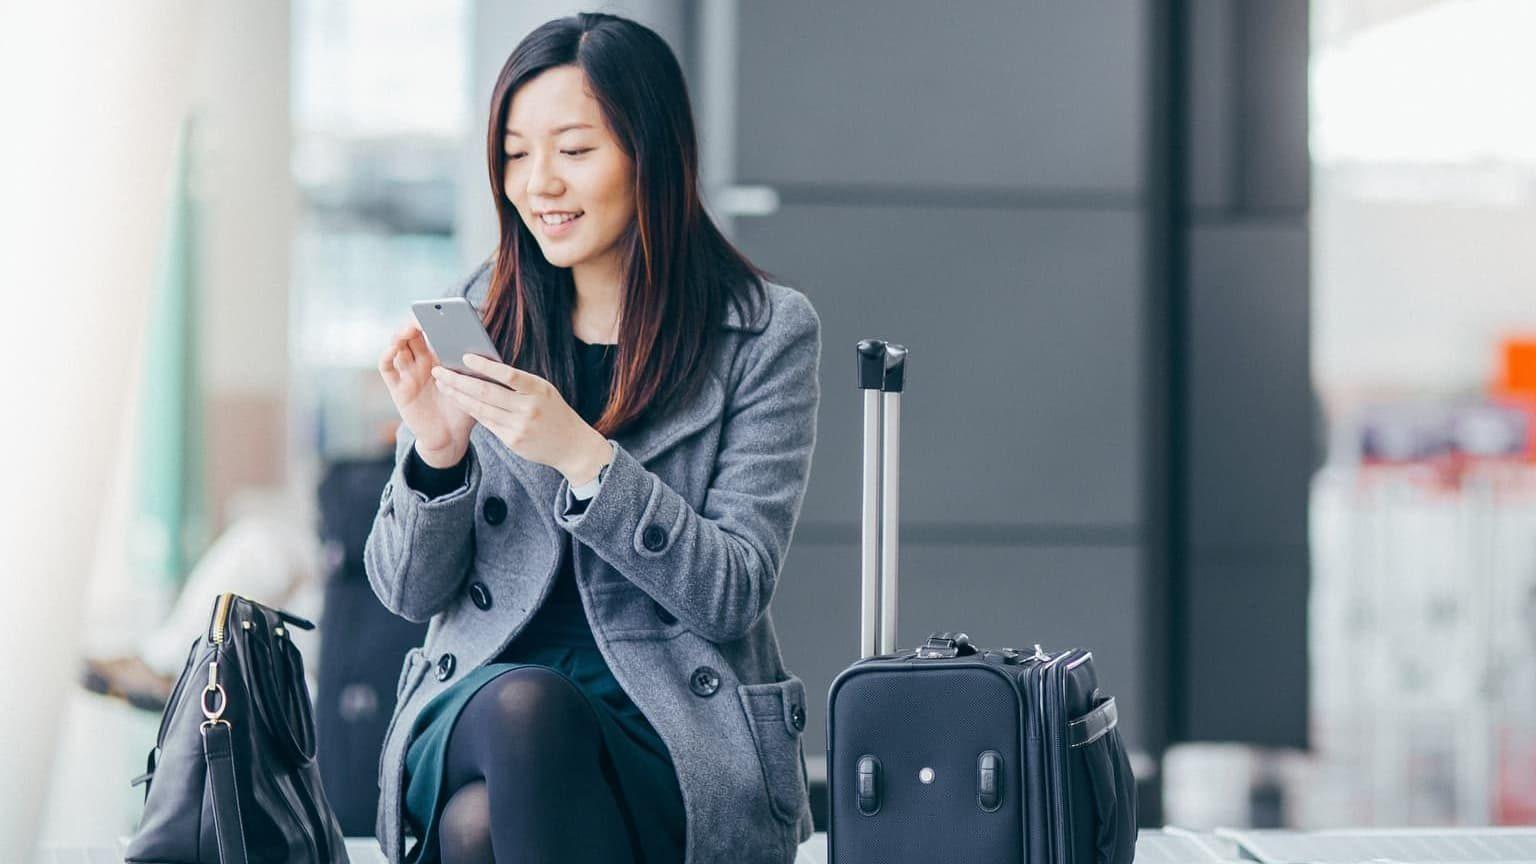 woman checking prepaid phone on airport